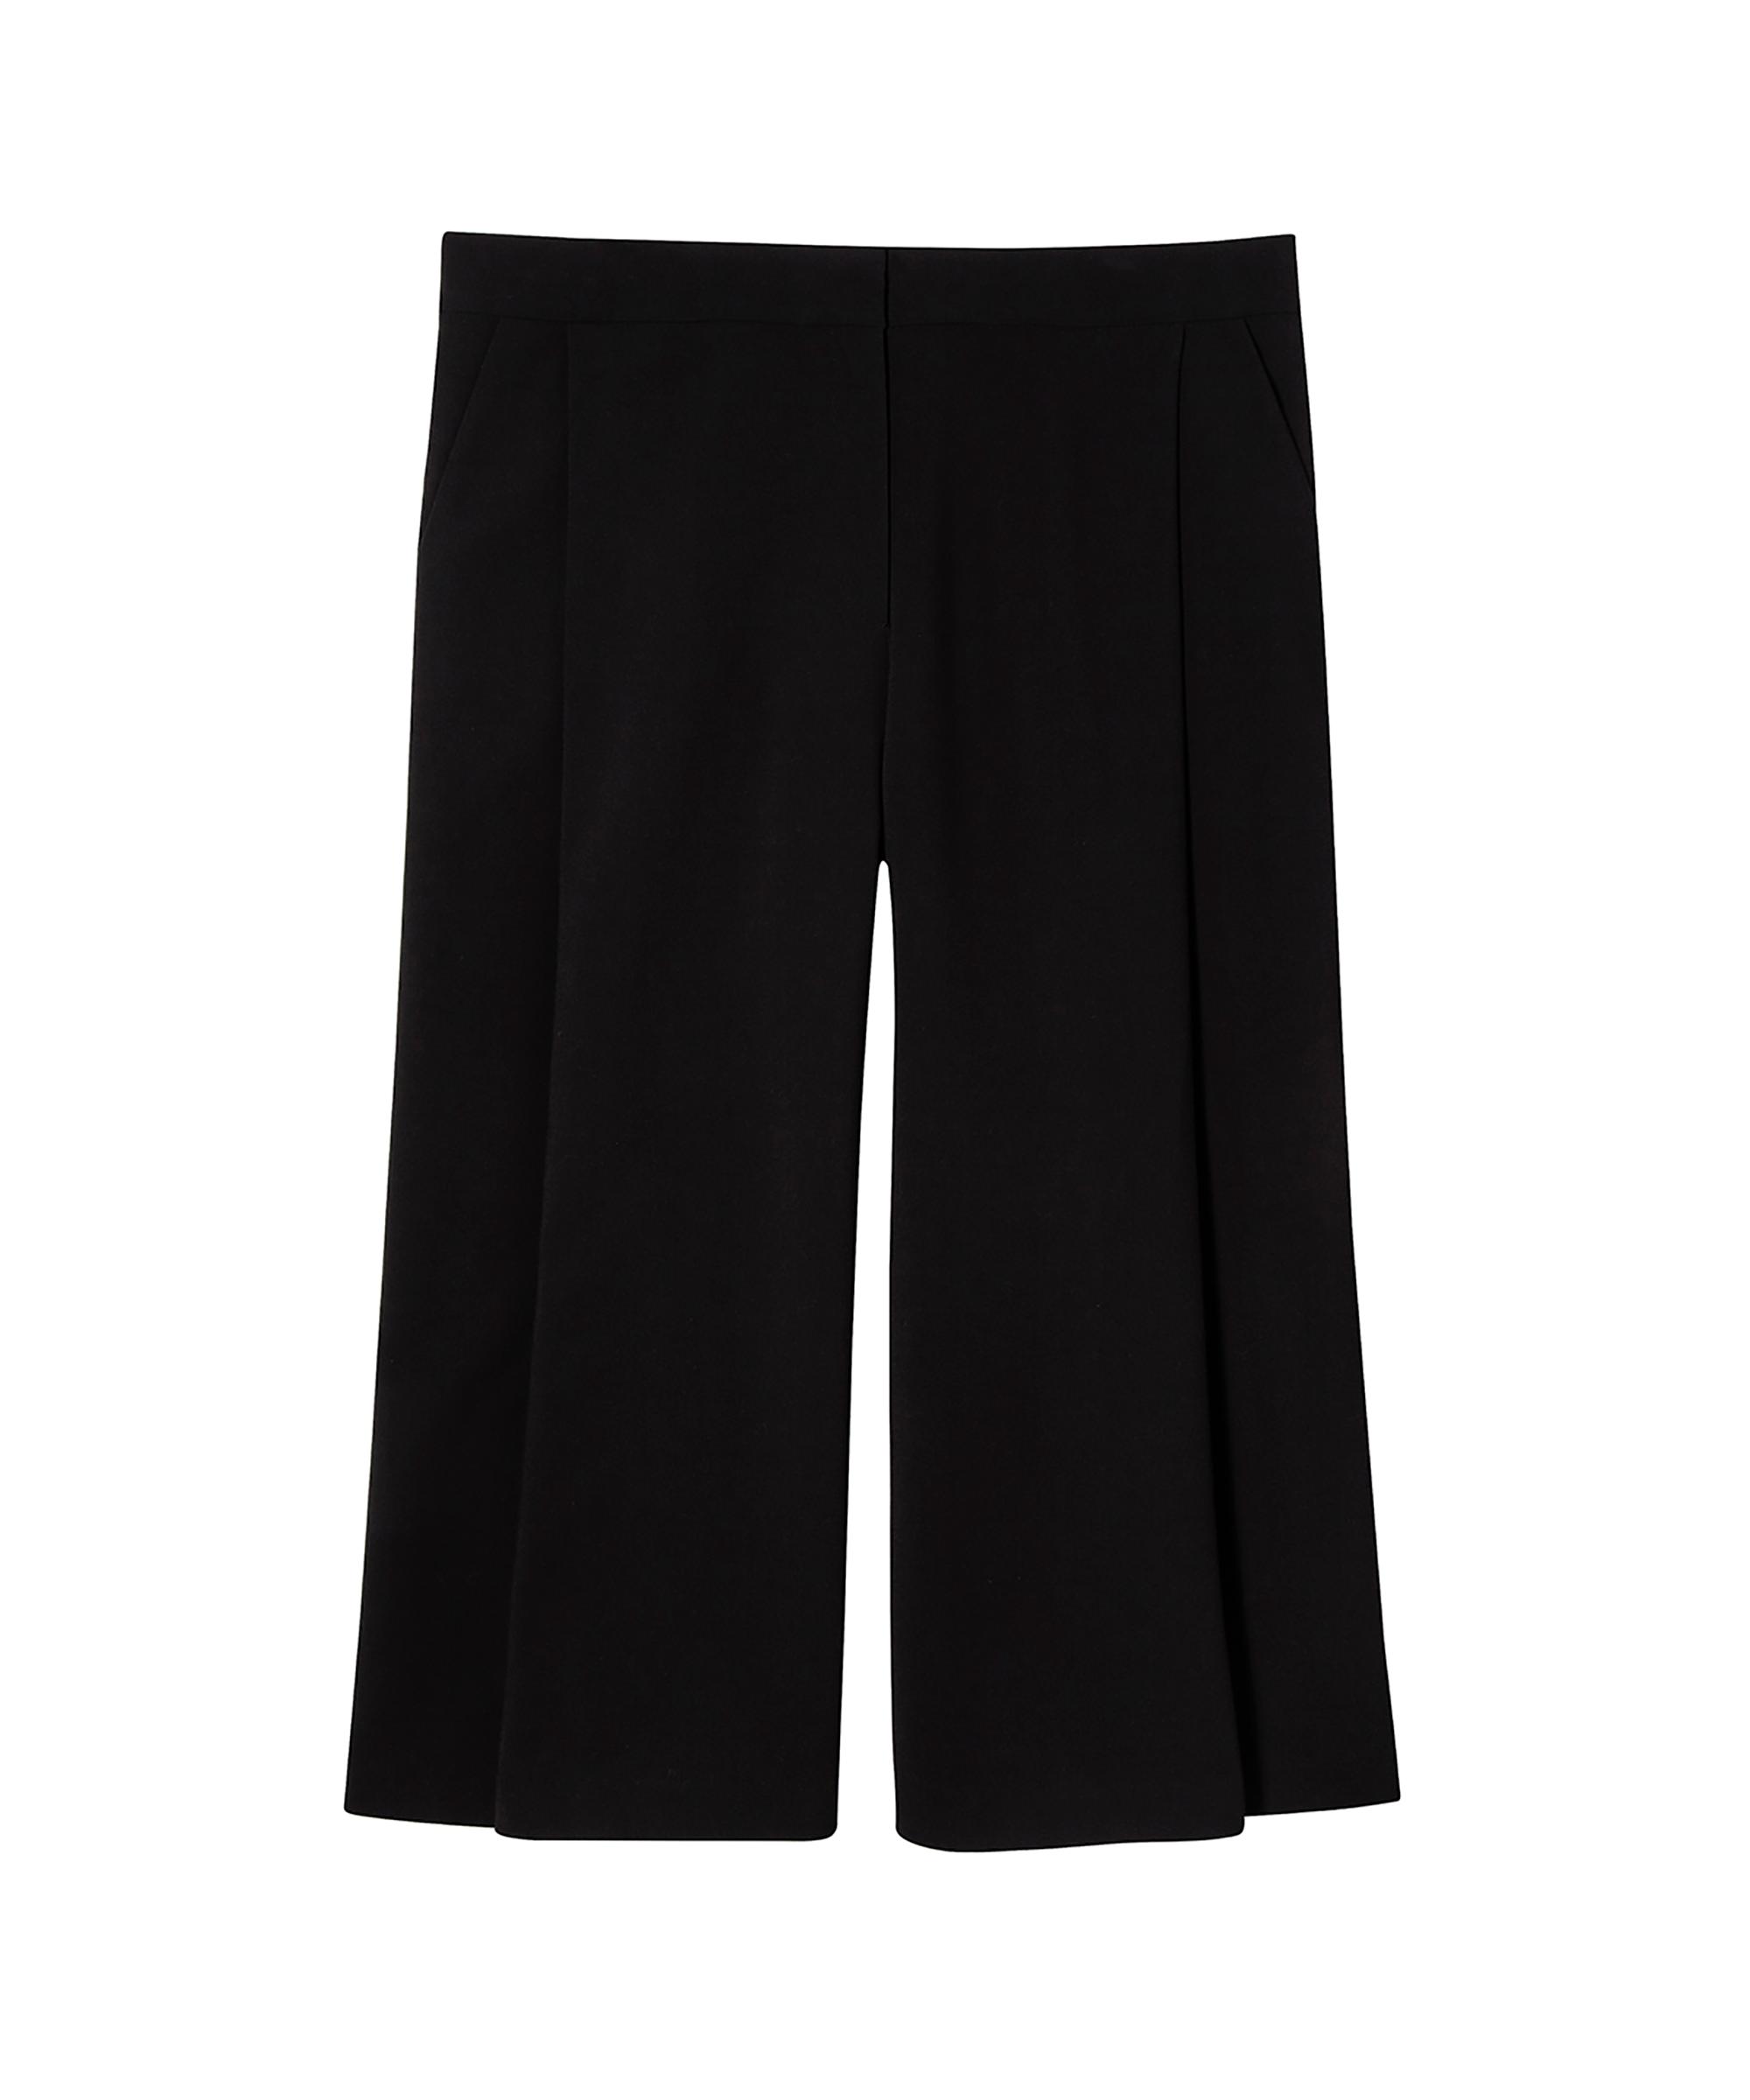 8fd25fdc3a Target Sale Victoria Beckham Clothing Line Discounts